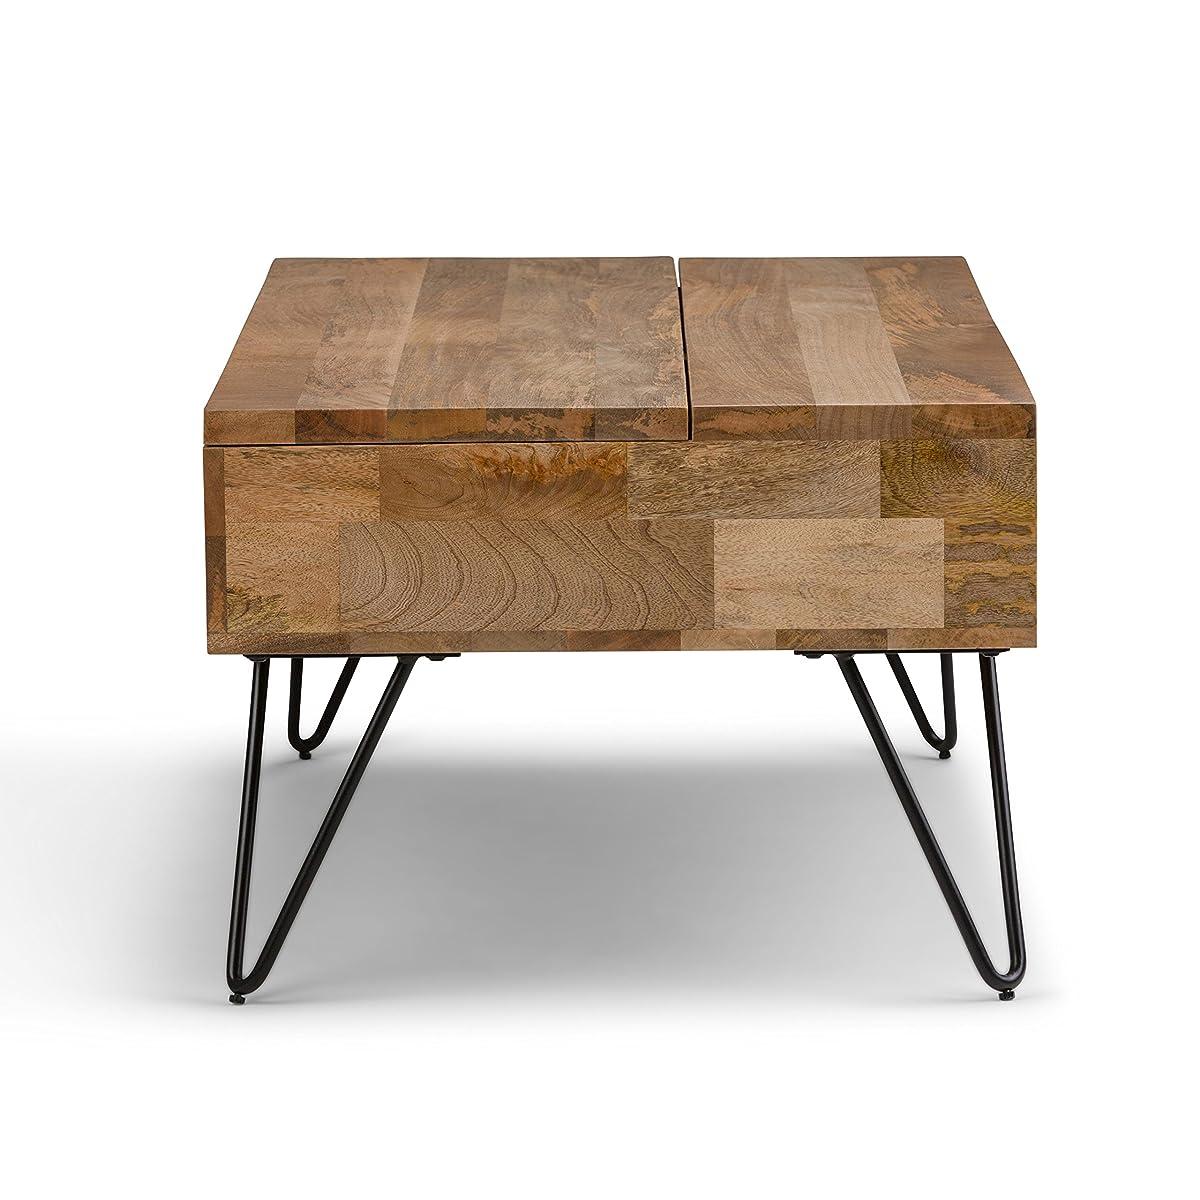 Simpli Home AXCHUN-01 Hunter Solid Mango Wood Mid-Century Coffee Table in Natural